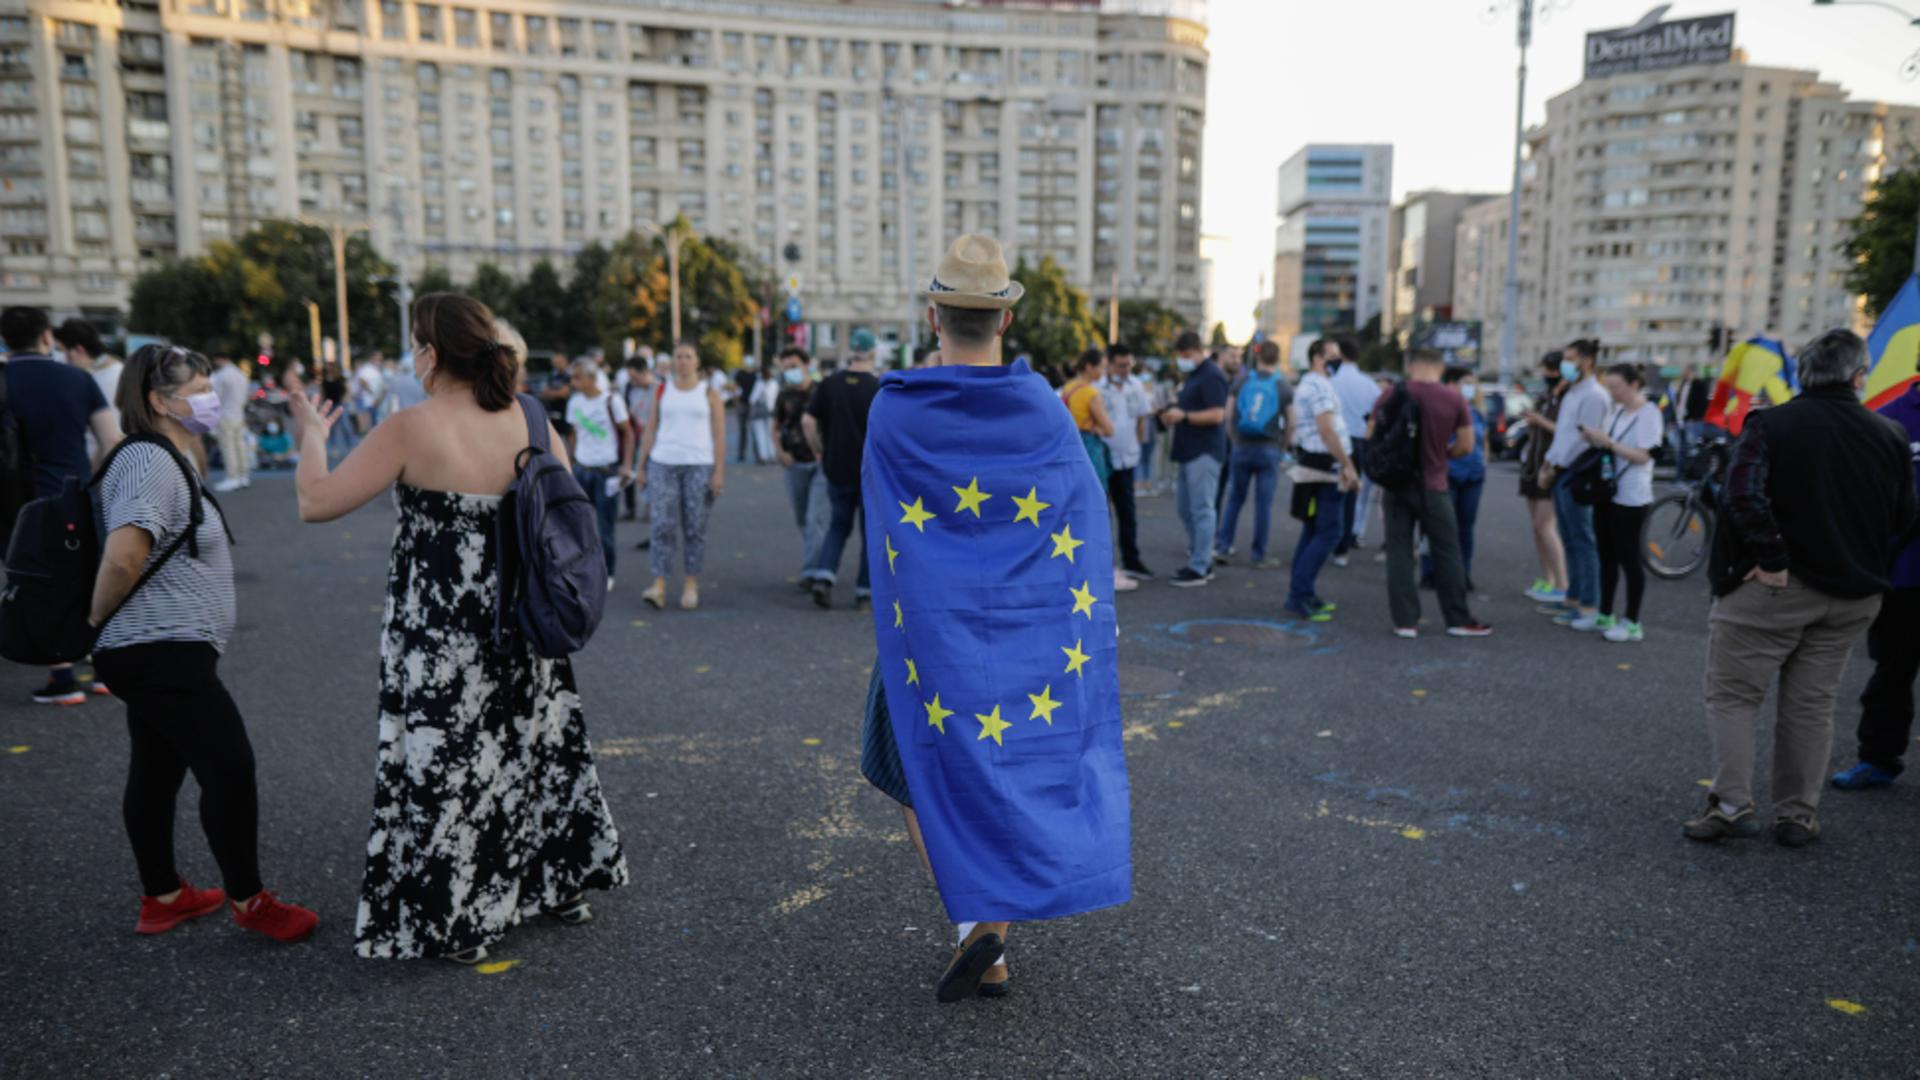 Avertisment dur pentru Guvern: Nu putem evita mișcări sociale! / Foto: Inquam Photos